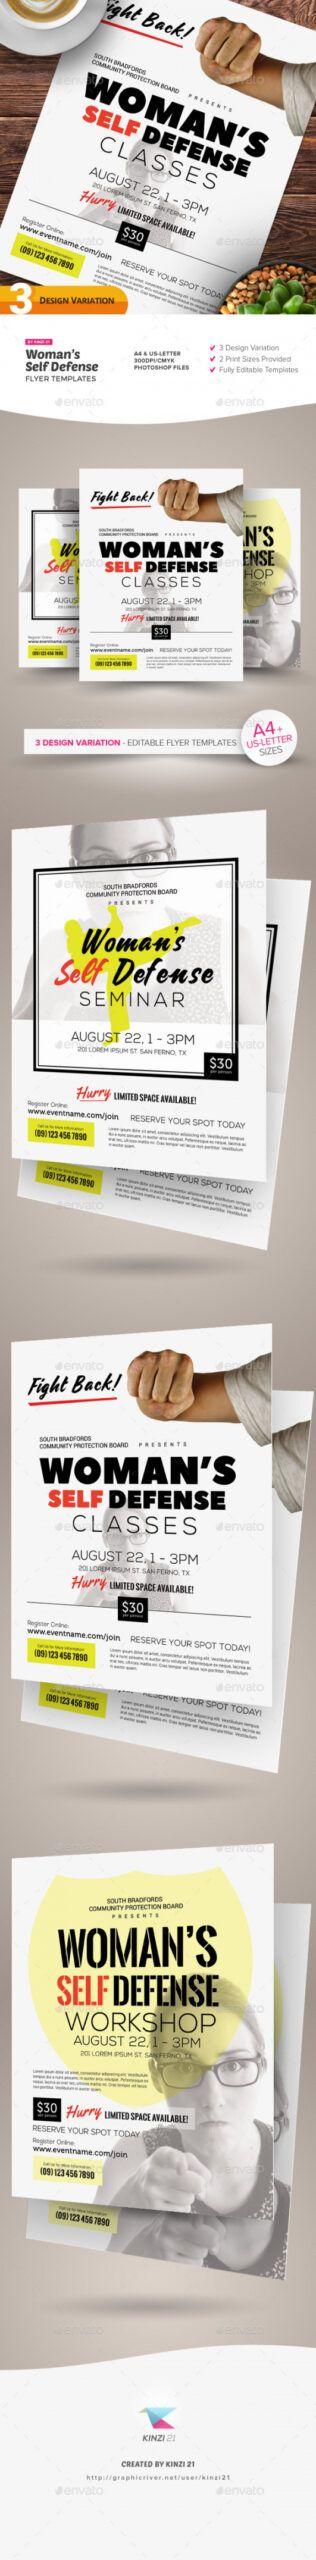 woman's self defense flyer templates self defense class flyer template doc